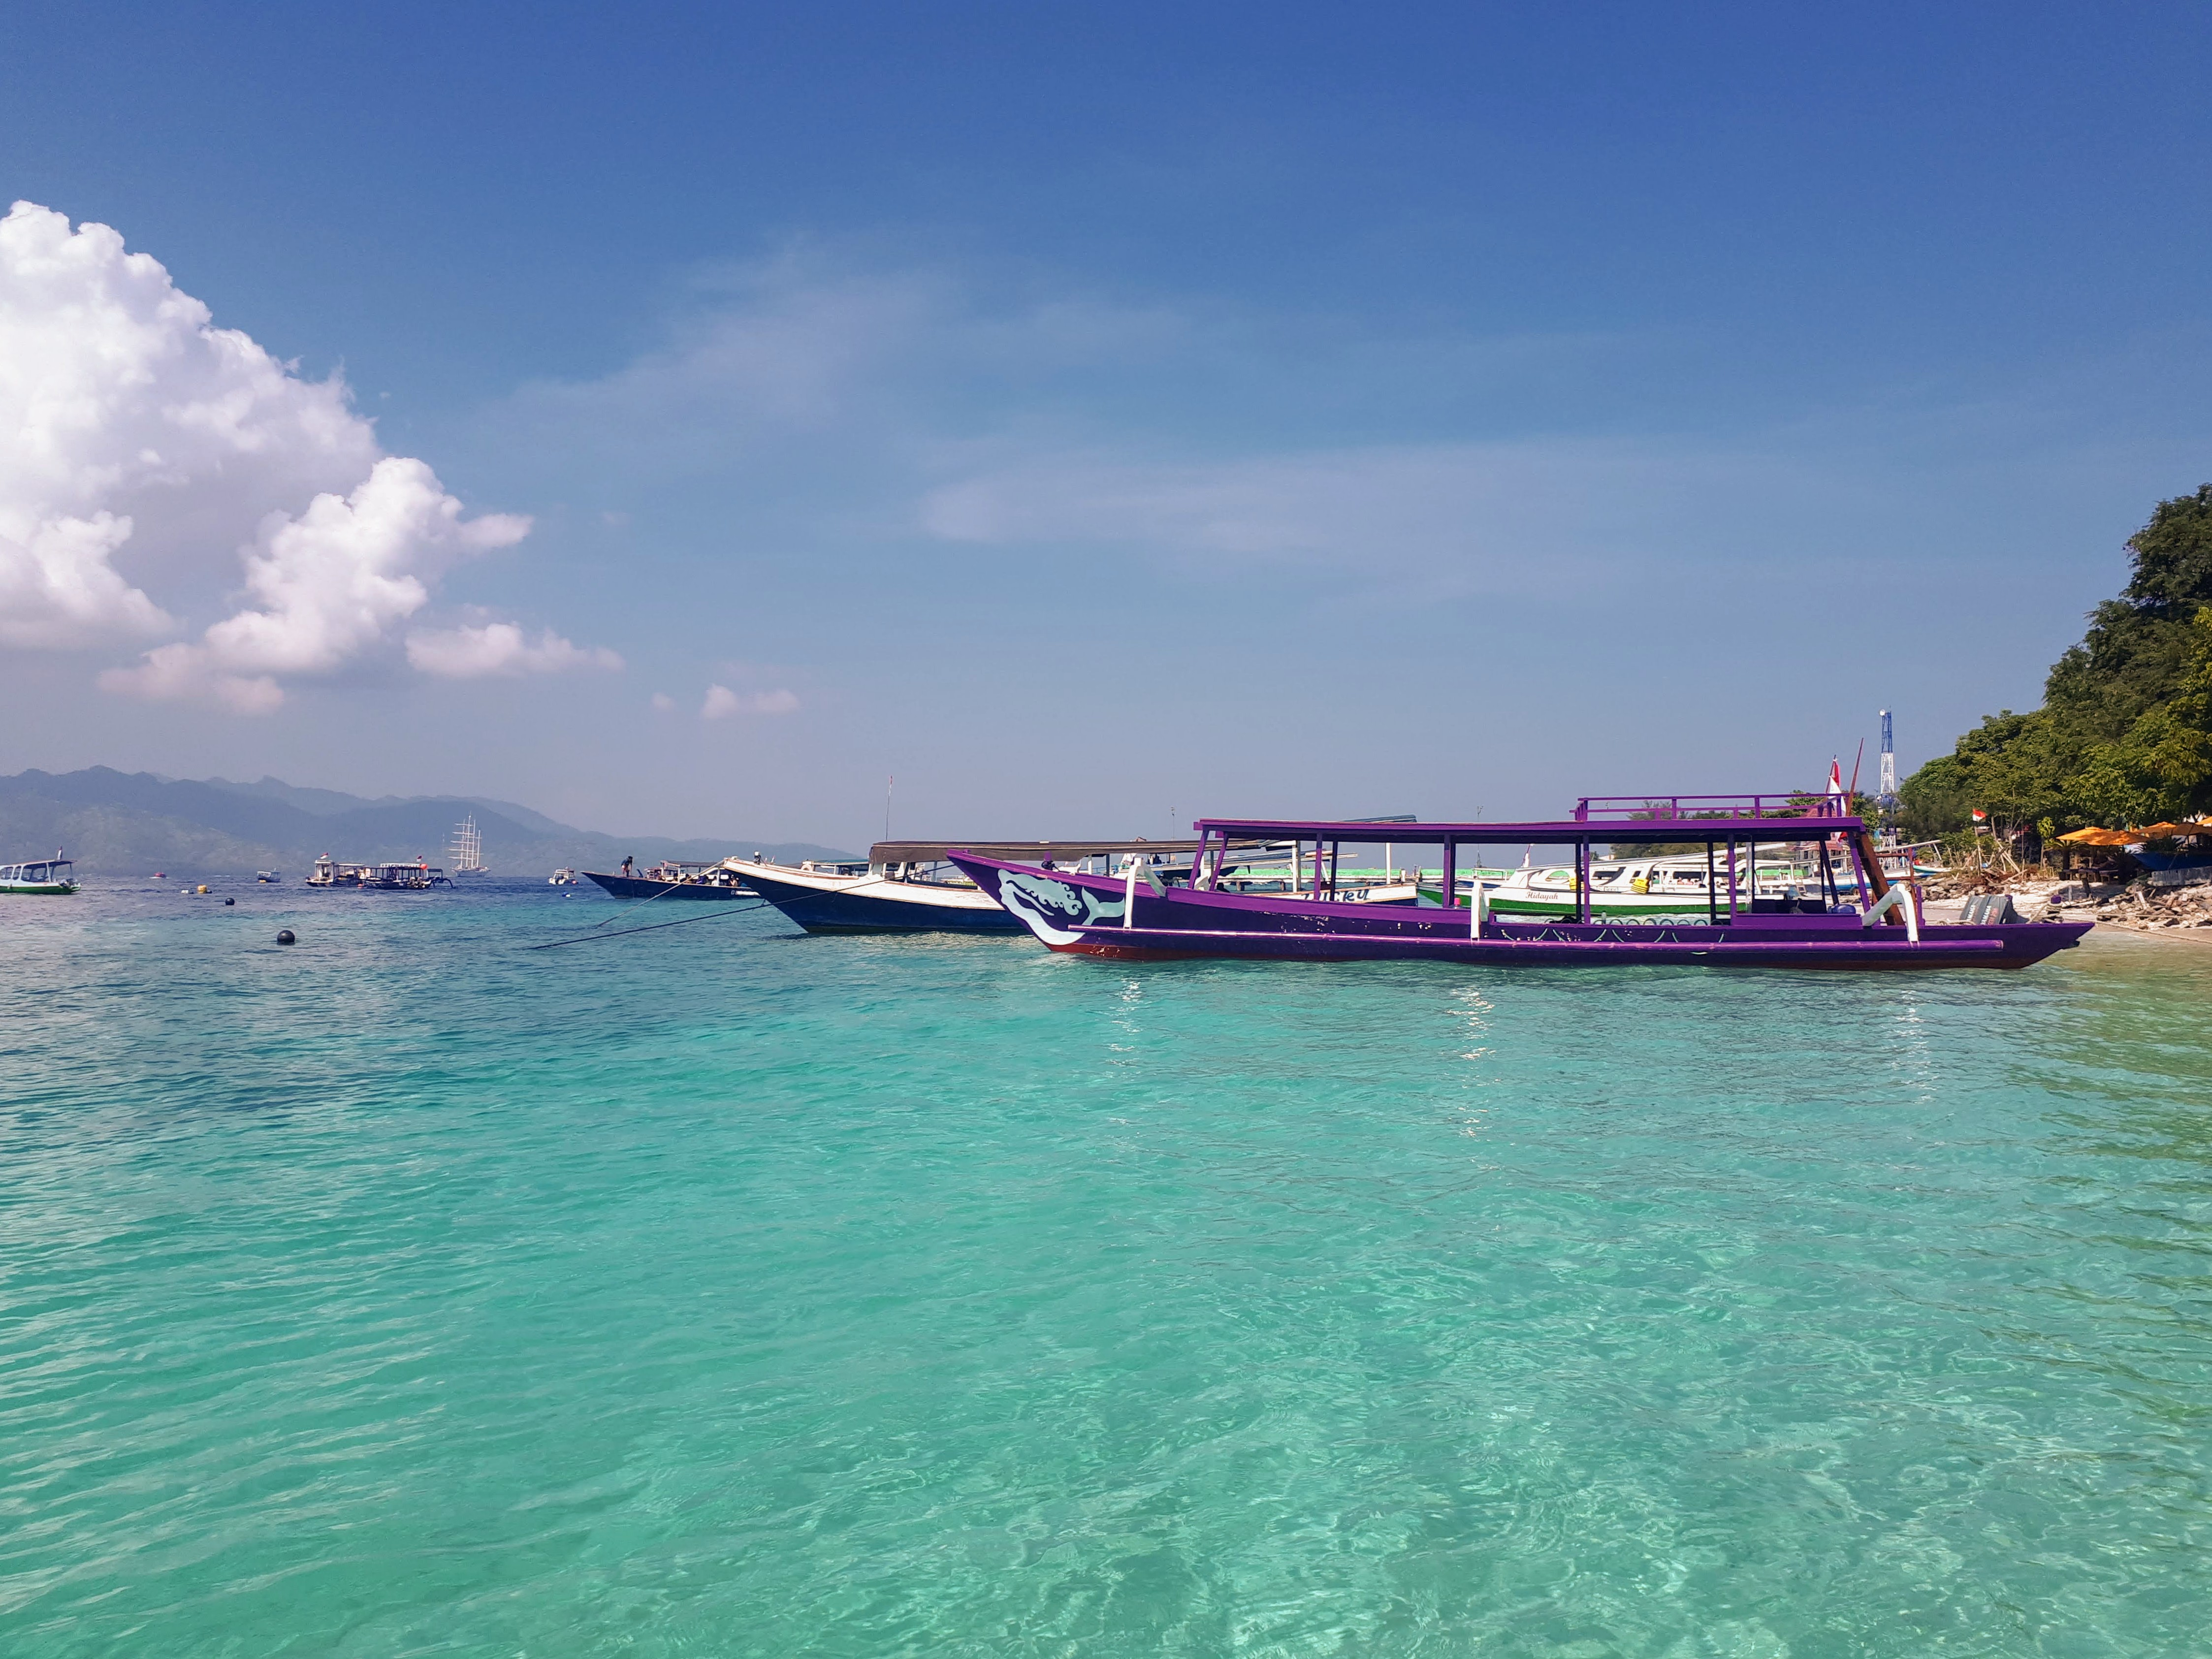 Arrivée sur Gili Air, Bali